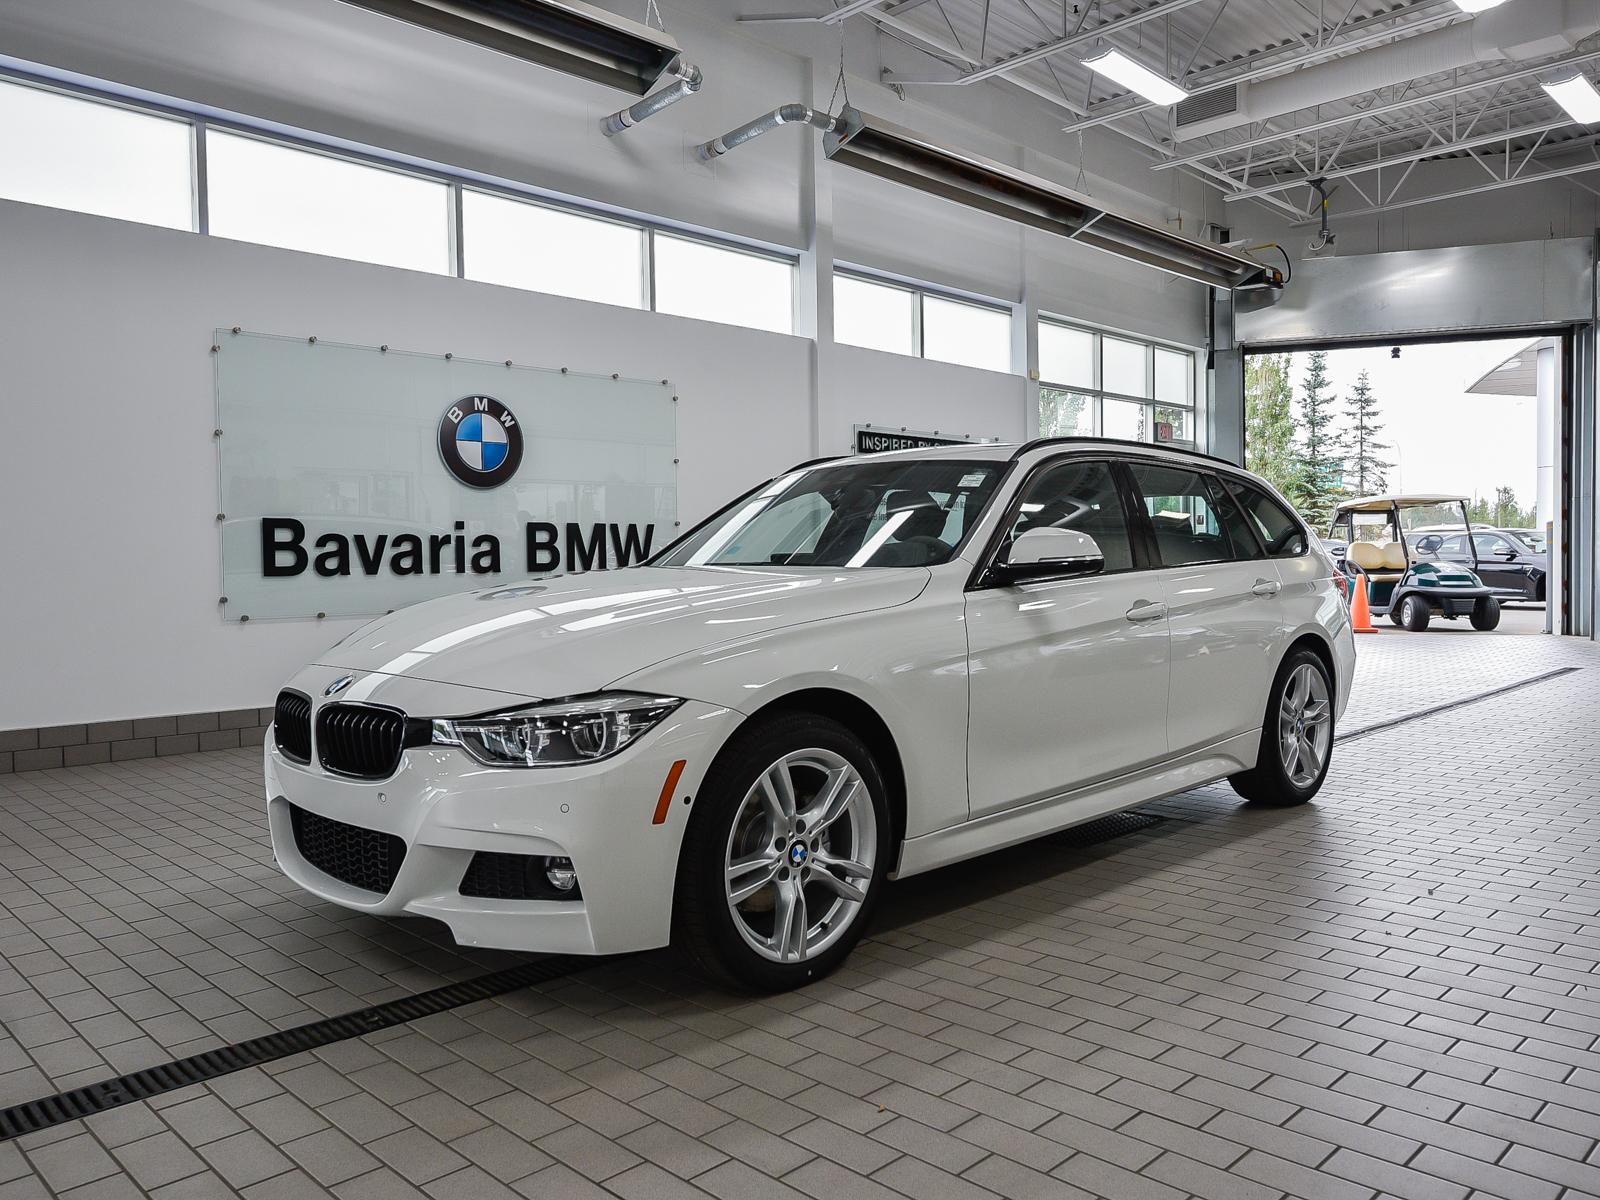 New 2018 BMW 330i xDrive Touring Sedan in Edmonton 183T3781